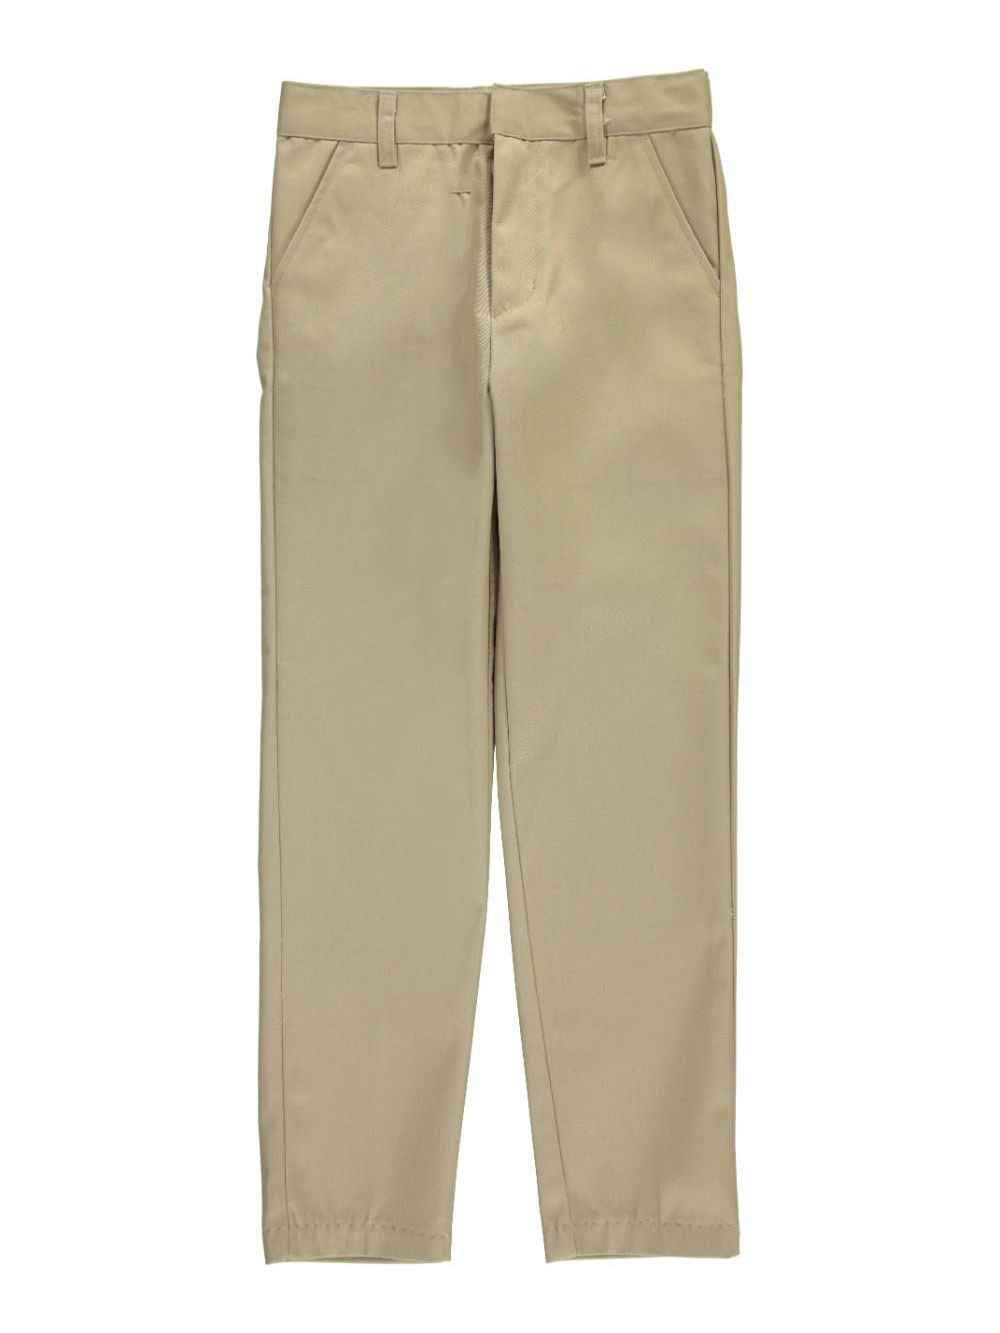 bc80a462effc02 Galaxy Boys' Flat Front School Uniform Pants | Boys' Uniforms ...